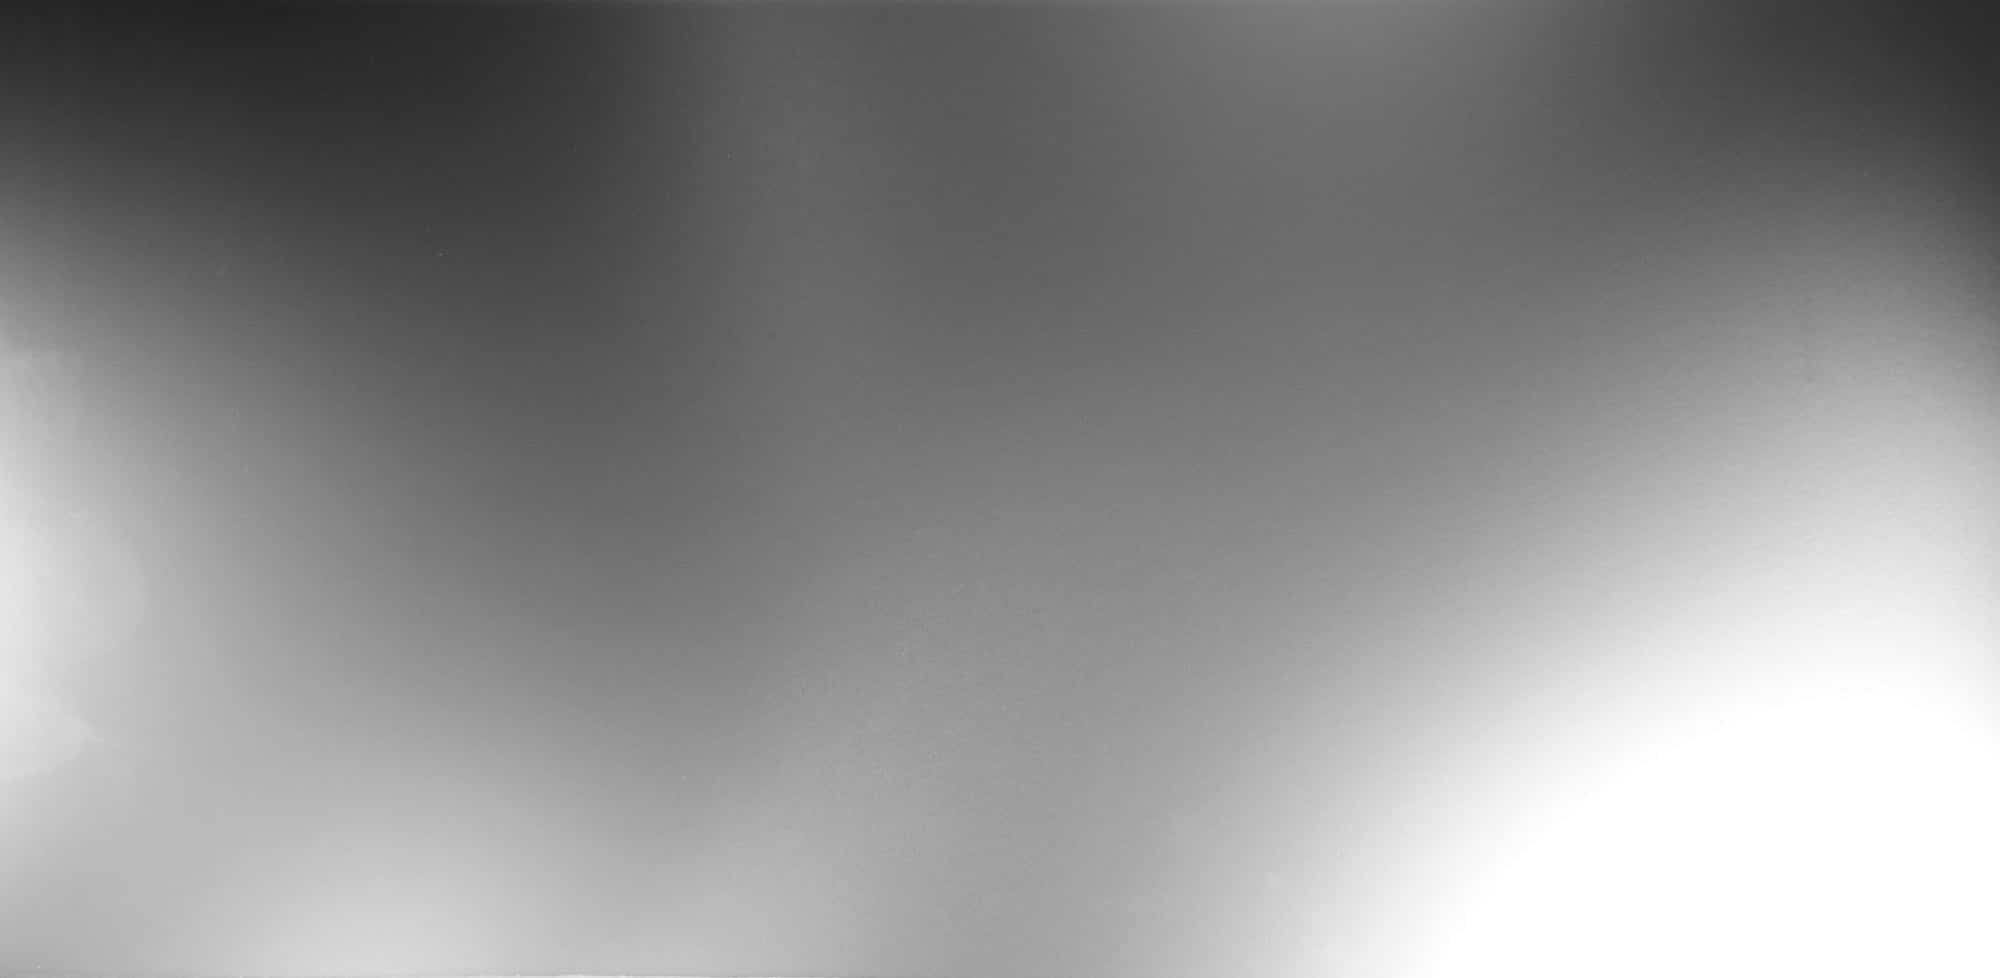 Schriftzug Acrylglas Metallic Anthrazit Silber